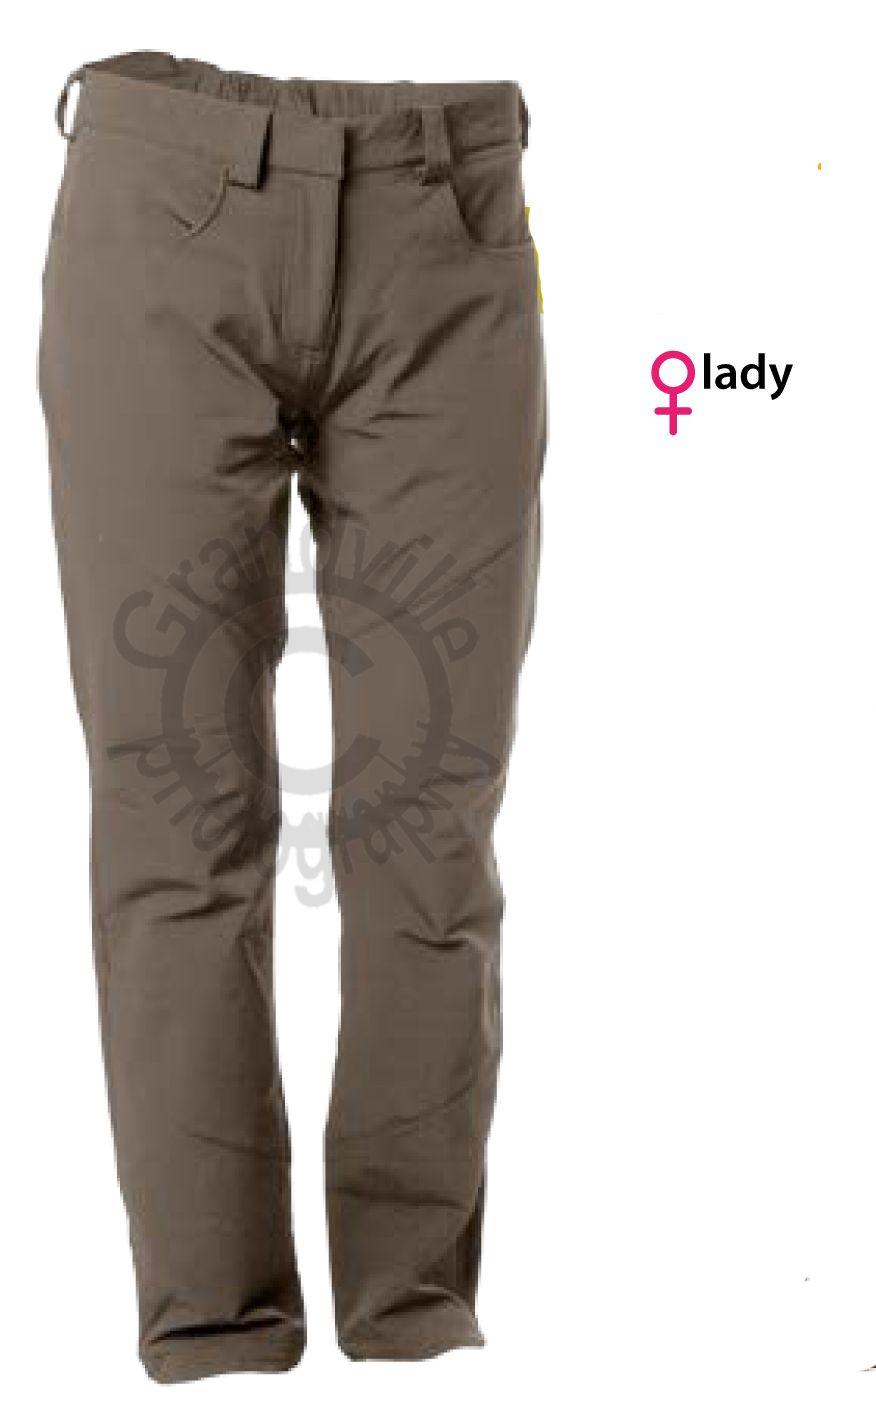 Tazz-Sport - Warmpeace Flea lady sand/sand dámské kalhoty